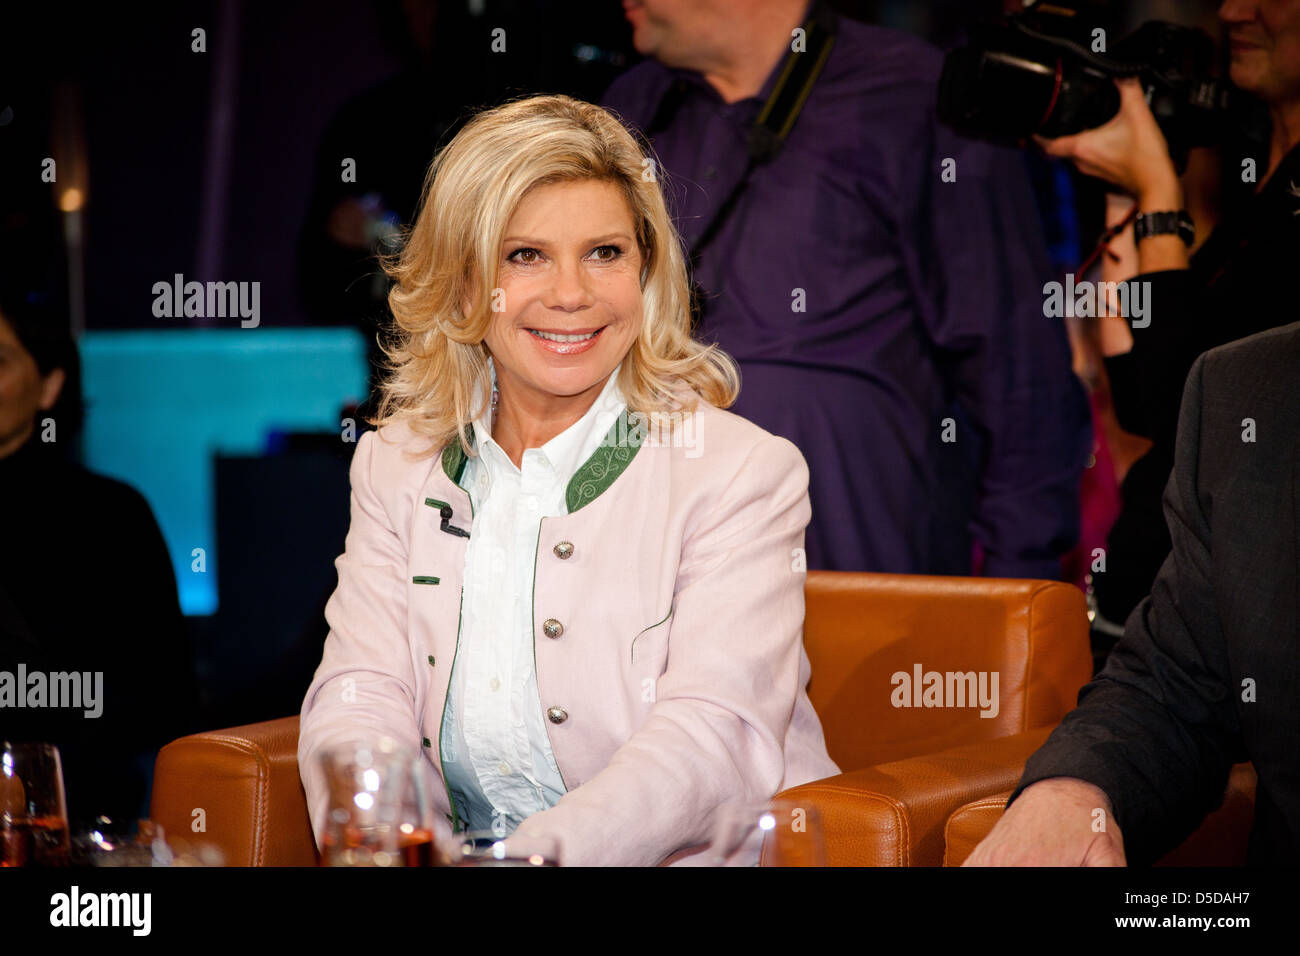 Marianne hartl stockfotos marianne hartl bilder alamy Moderatoren ndr talkshow